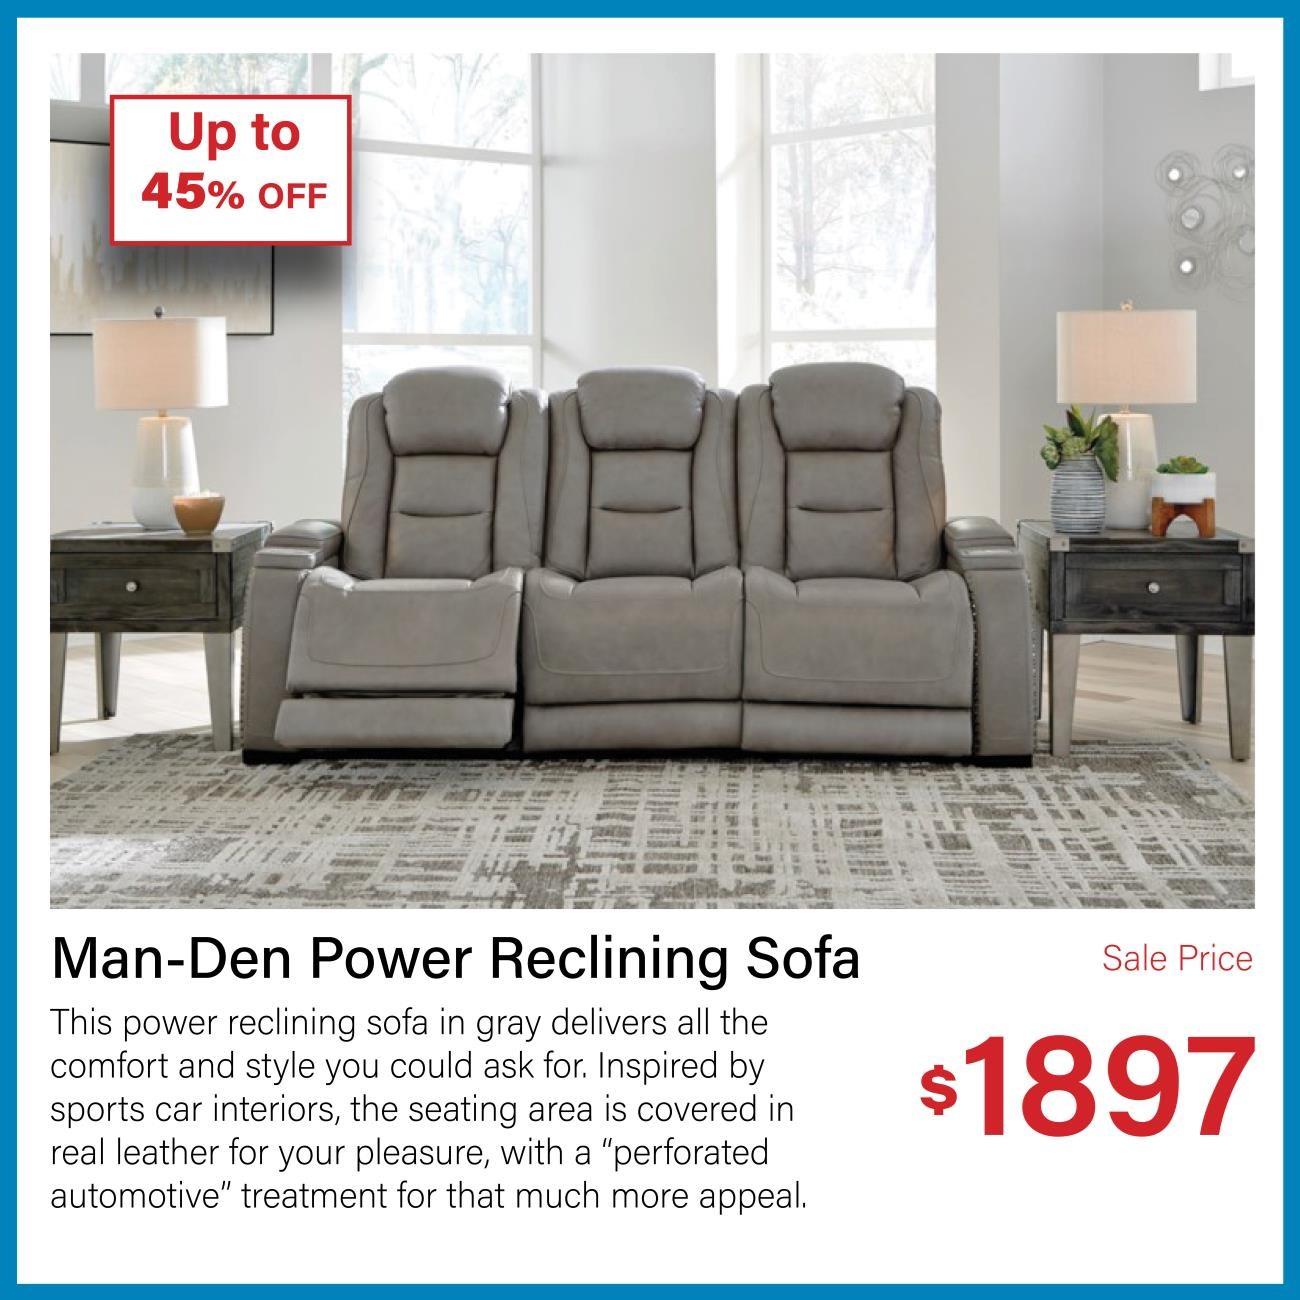 man-den power reclining sofa